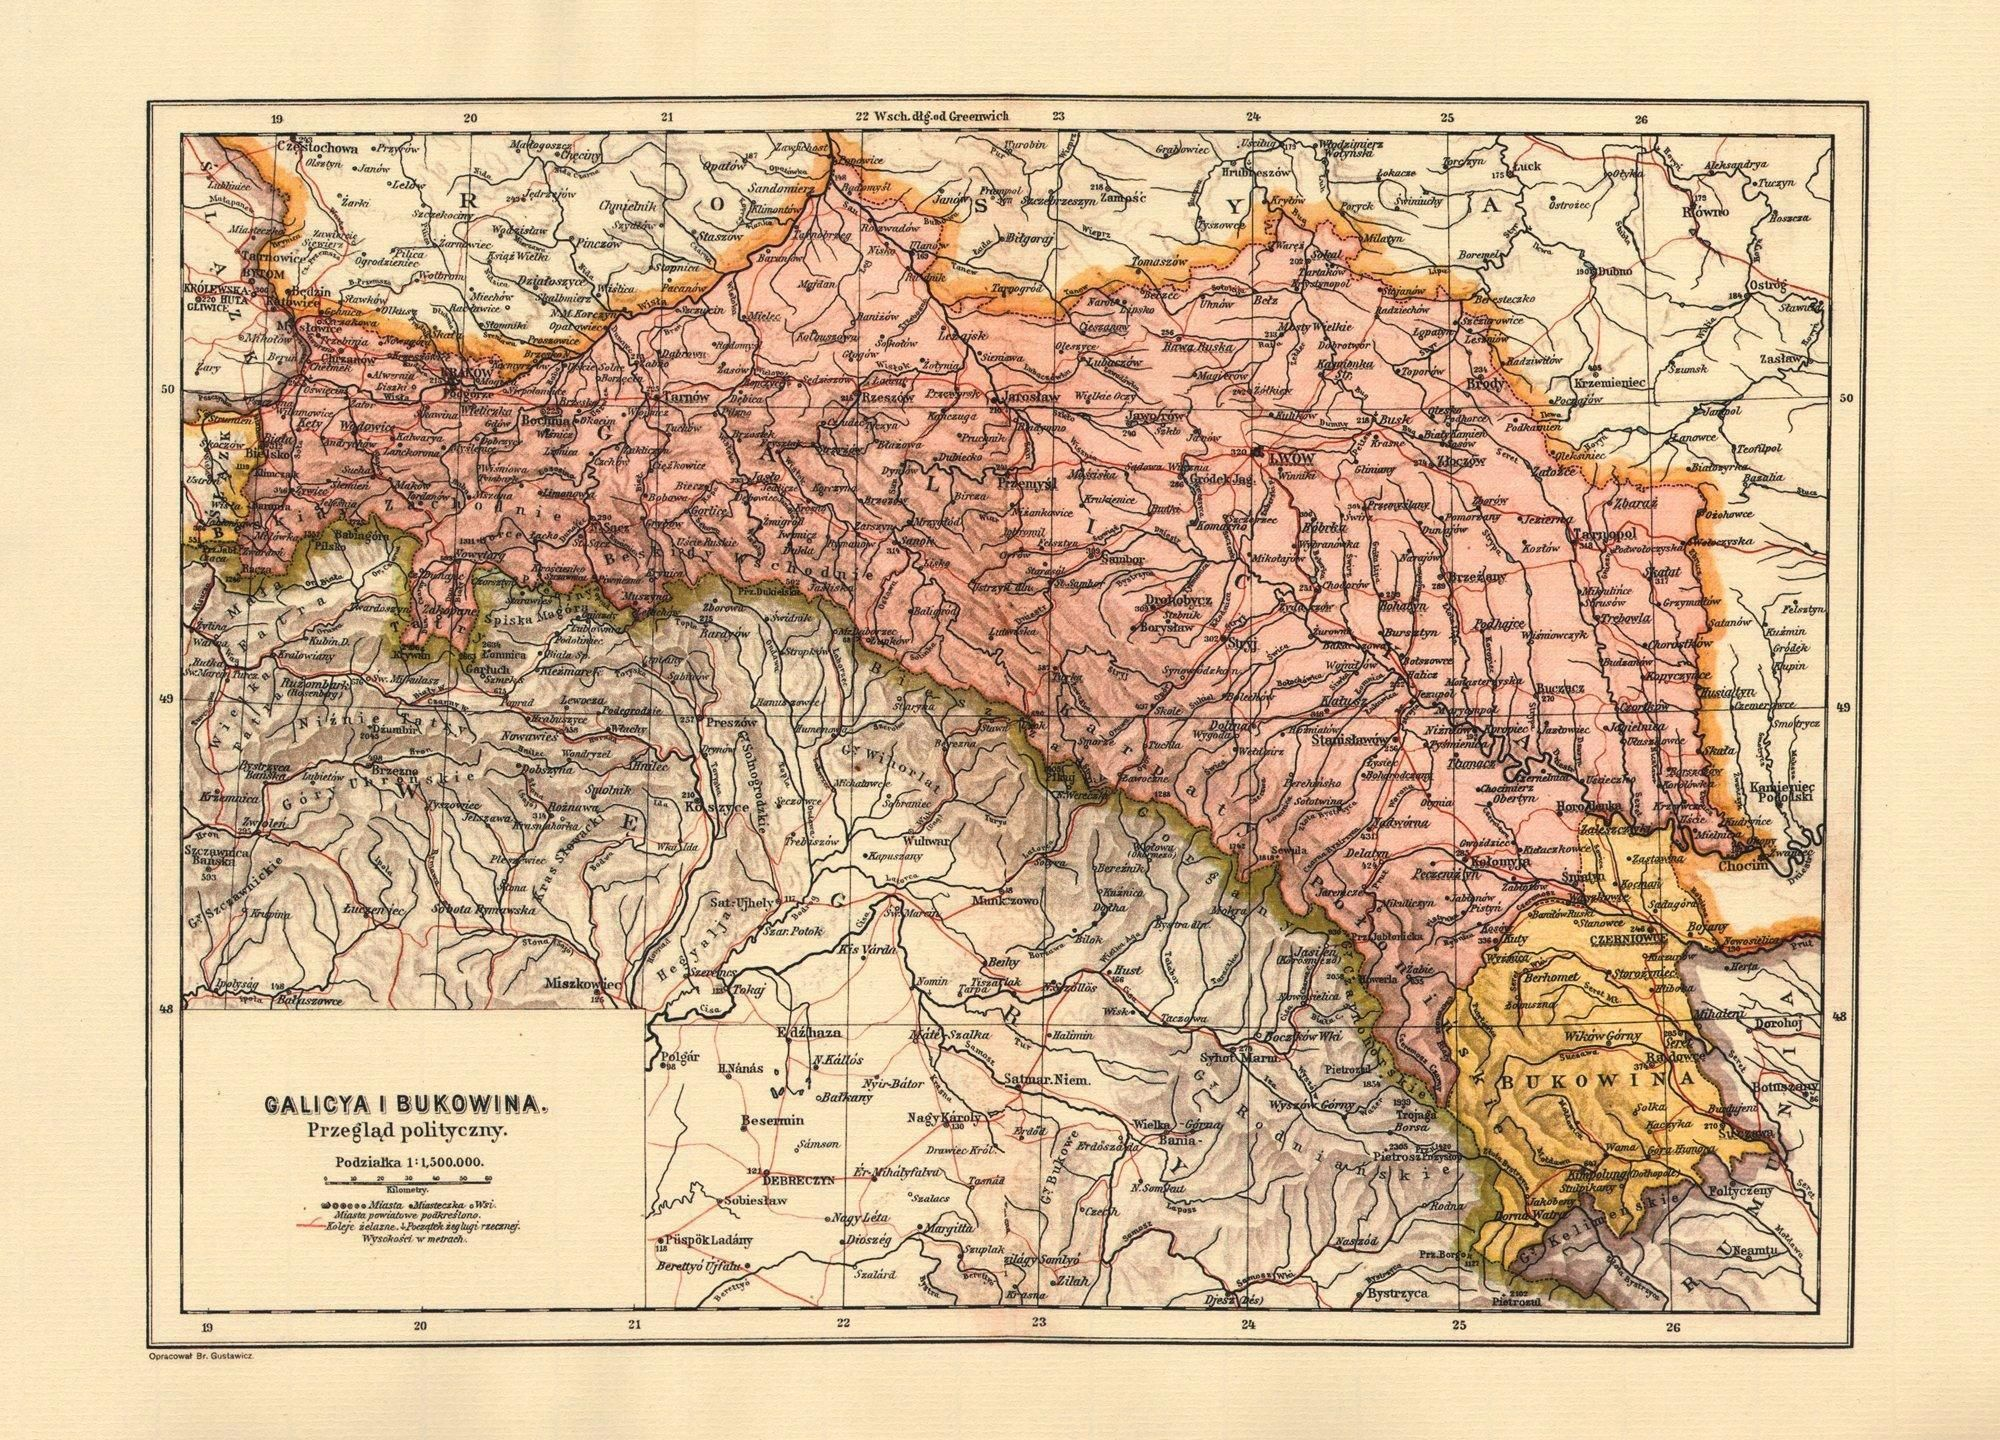 Galicia And Bukovina Provinces Of Austria Hungary 1900 Mapmania